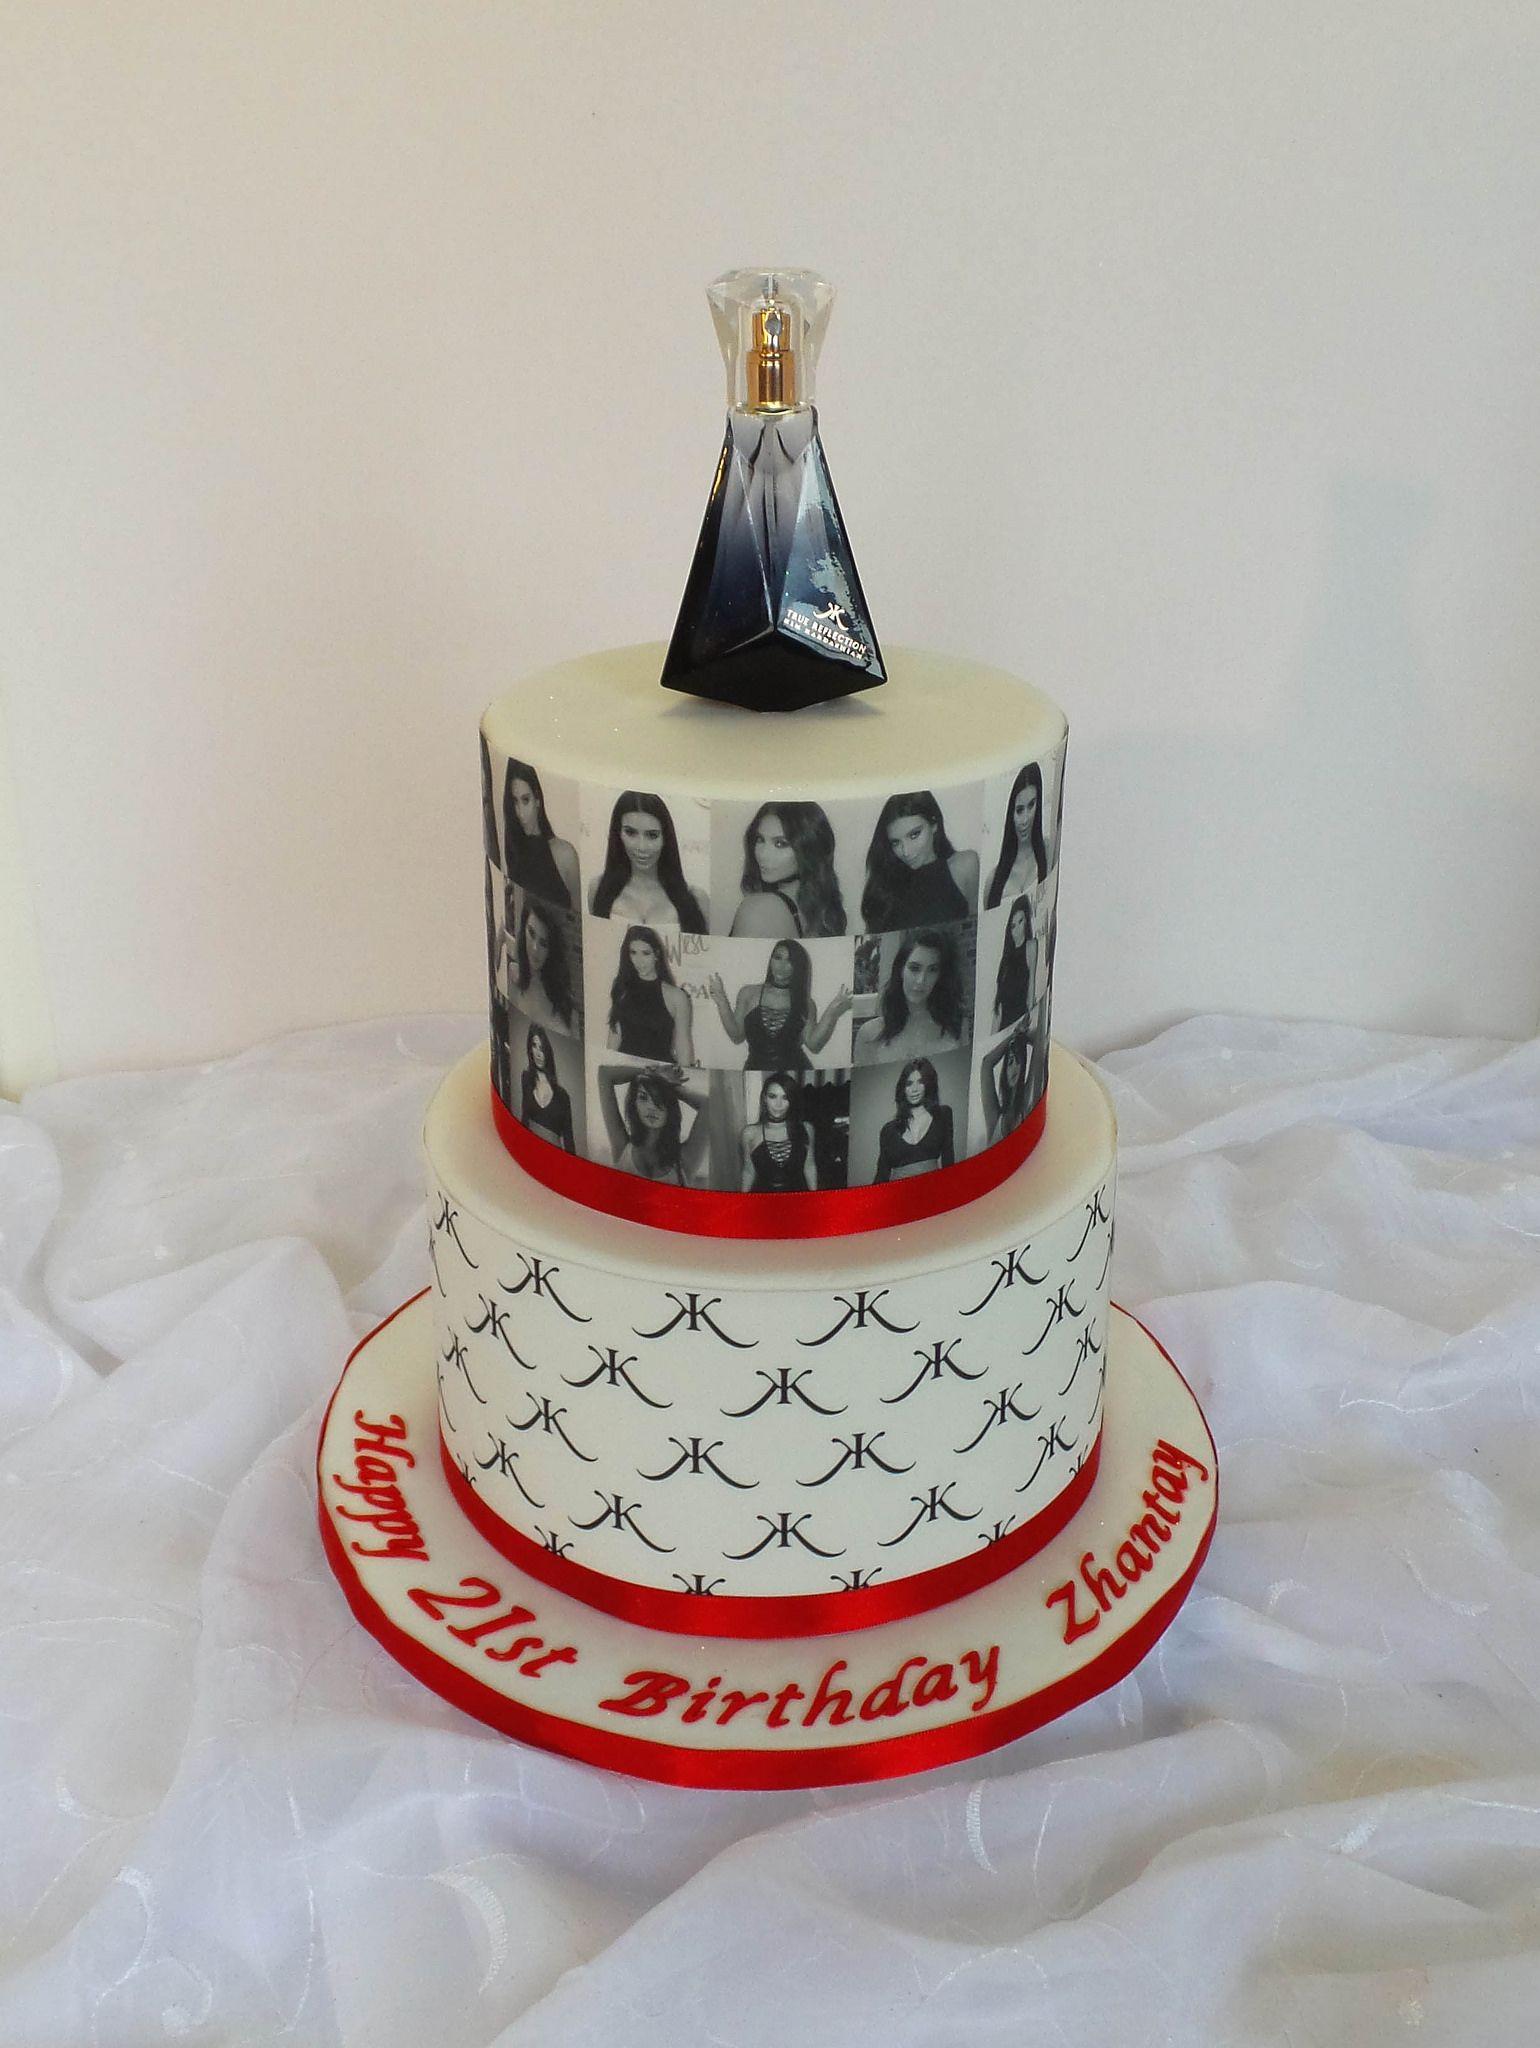 Kim Kardashian themed 21st birthday cake in 2020 Special